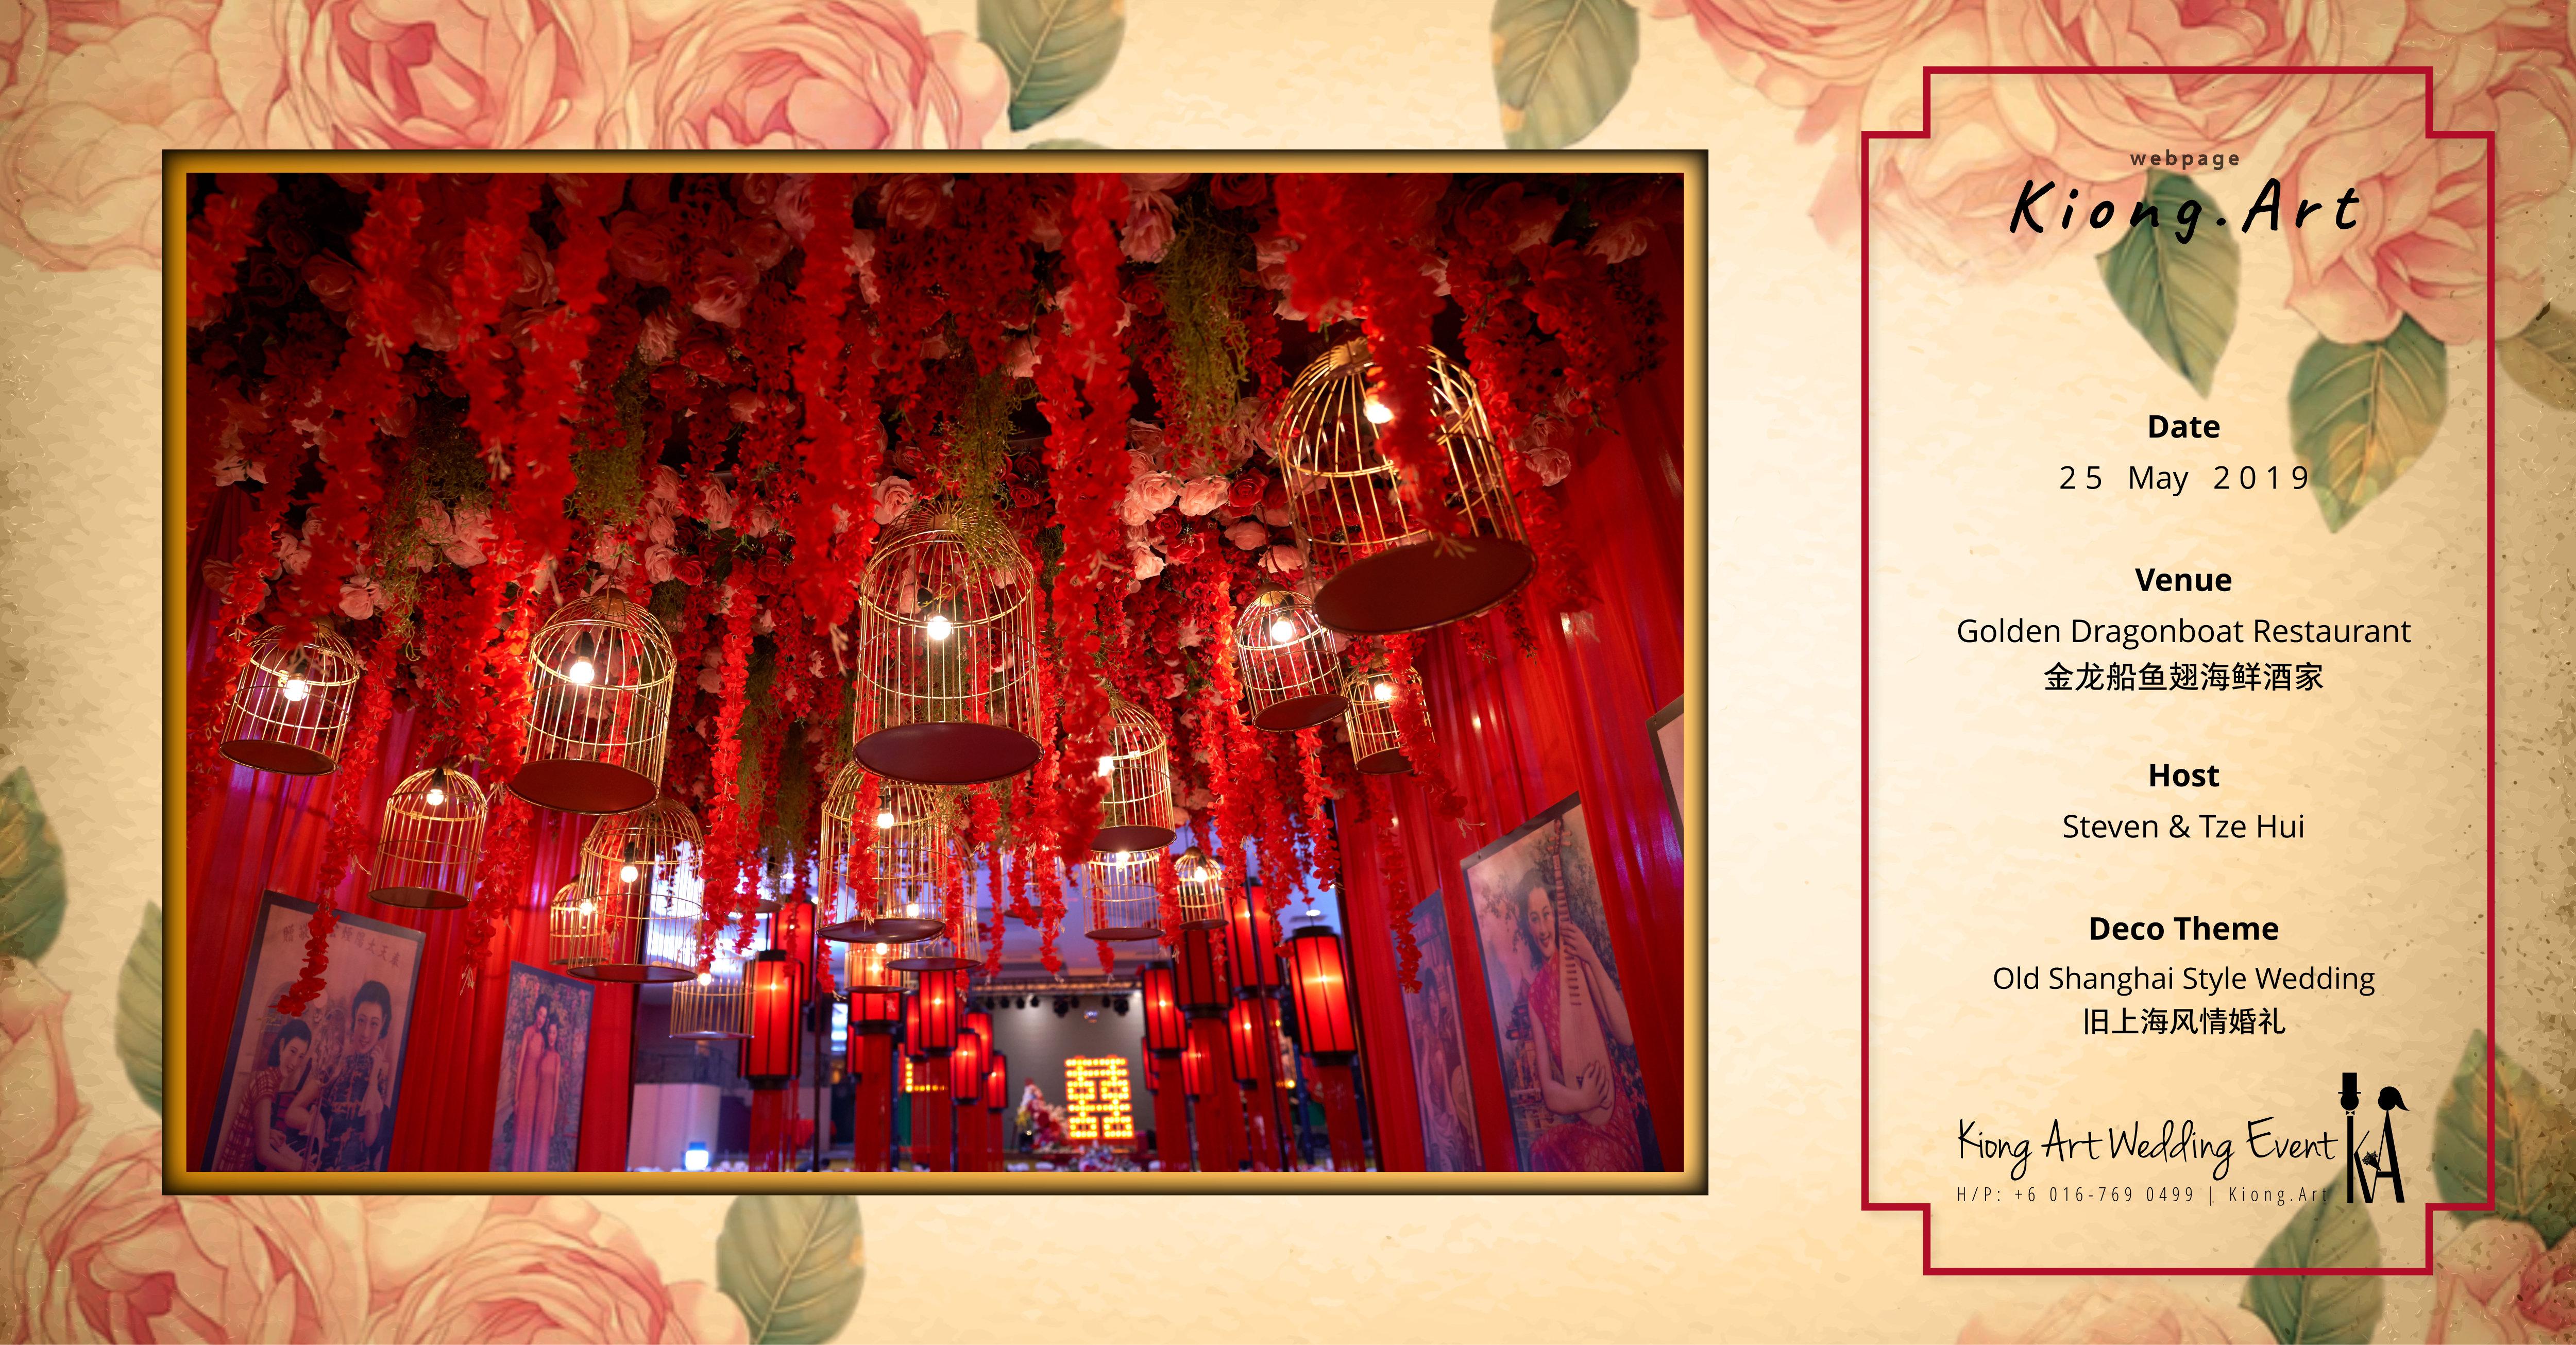 Kuala Lumpur Wedding Deco Decoration Kiong Art Wedding Deco Old Shanghai Style Wedding 旧上海风情婚礼 Steven and Tze Hui at Golden Dragonboat Restaurant 金龙船鱼翅海鲜酒家 Malaysia A16-B00-012